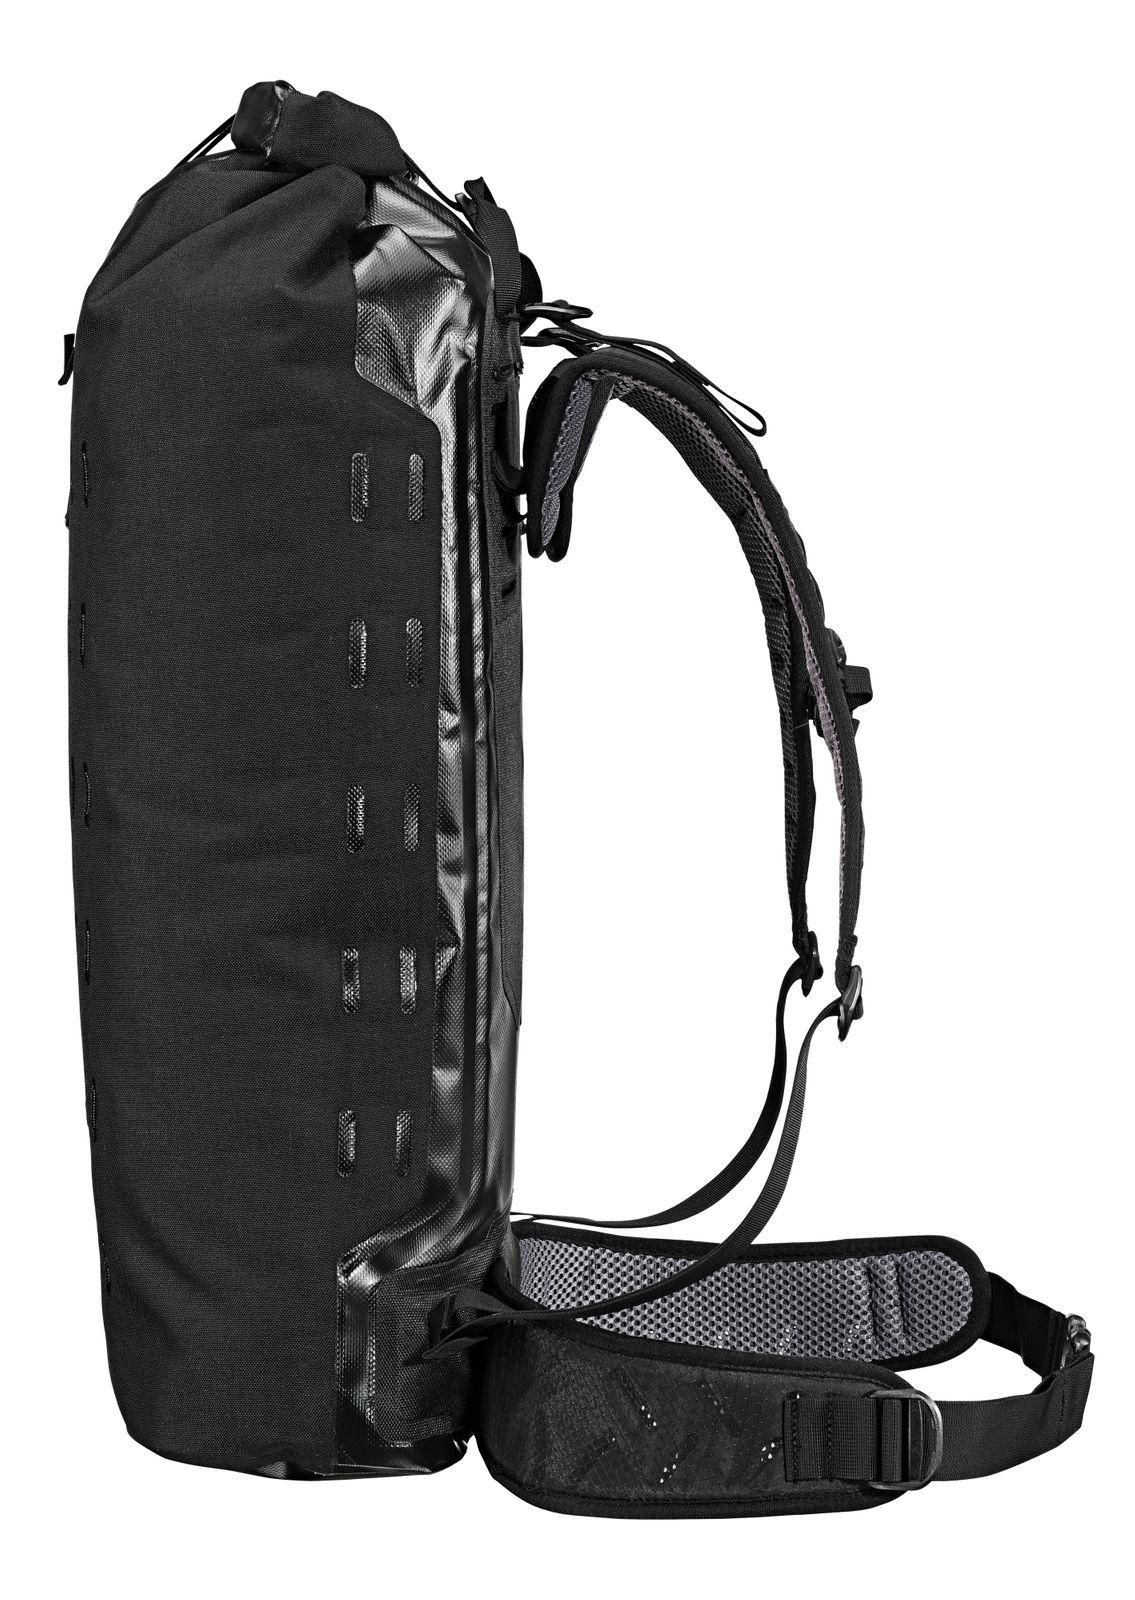 ORTLIEB Gear-Pack Bike / Outdoor Backpack 32L Black